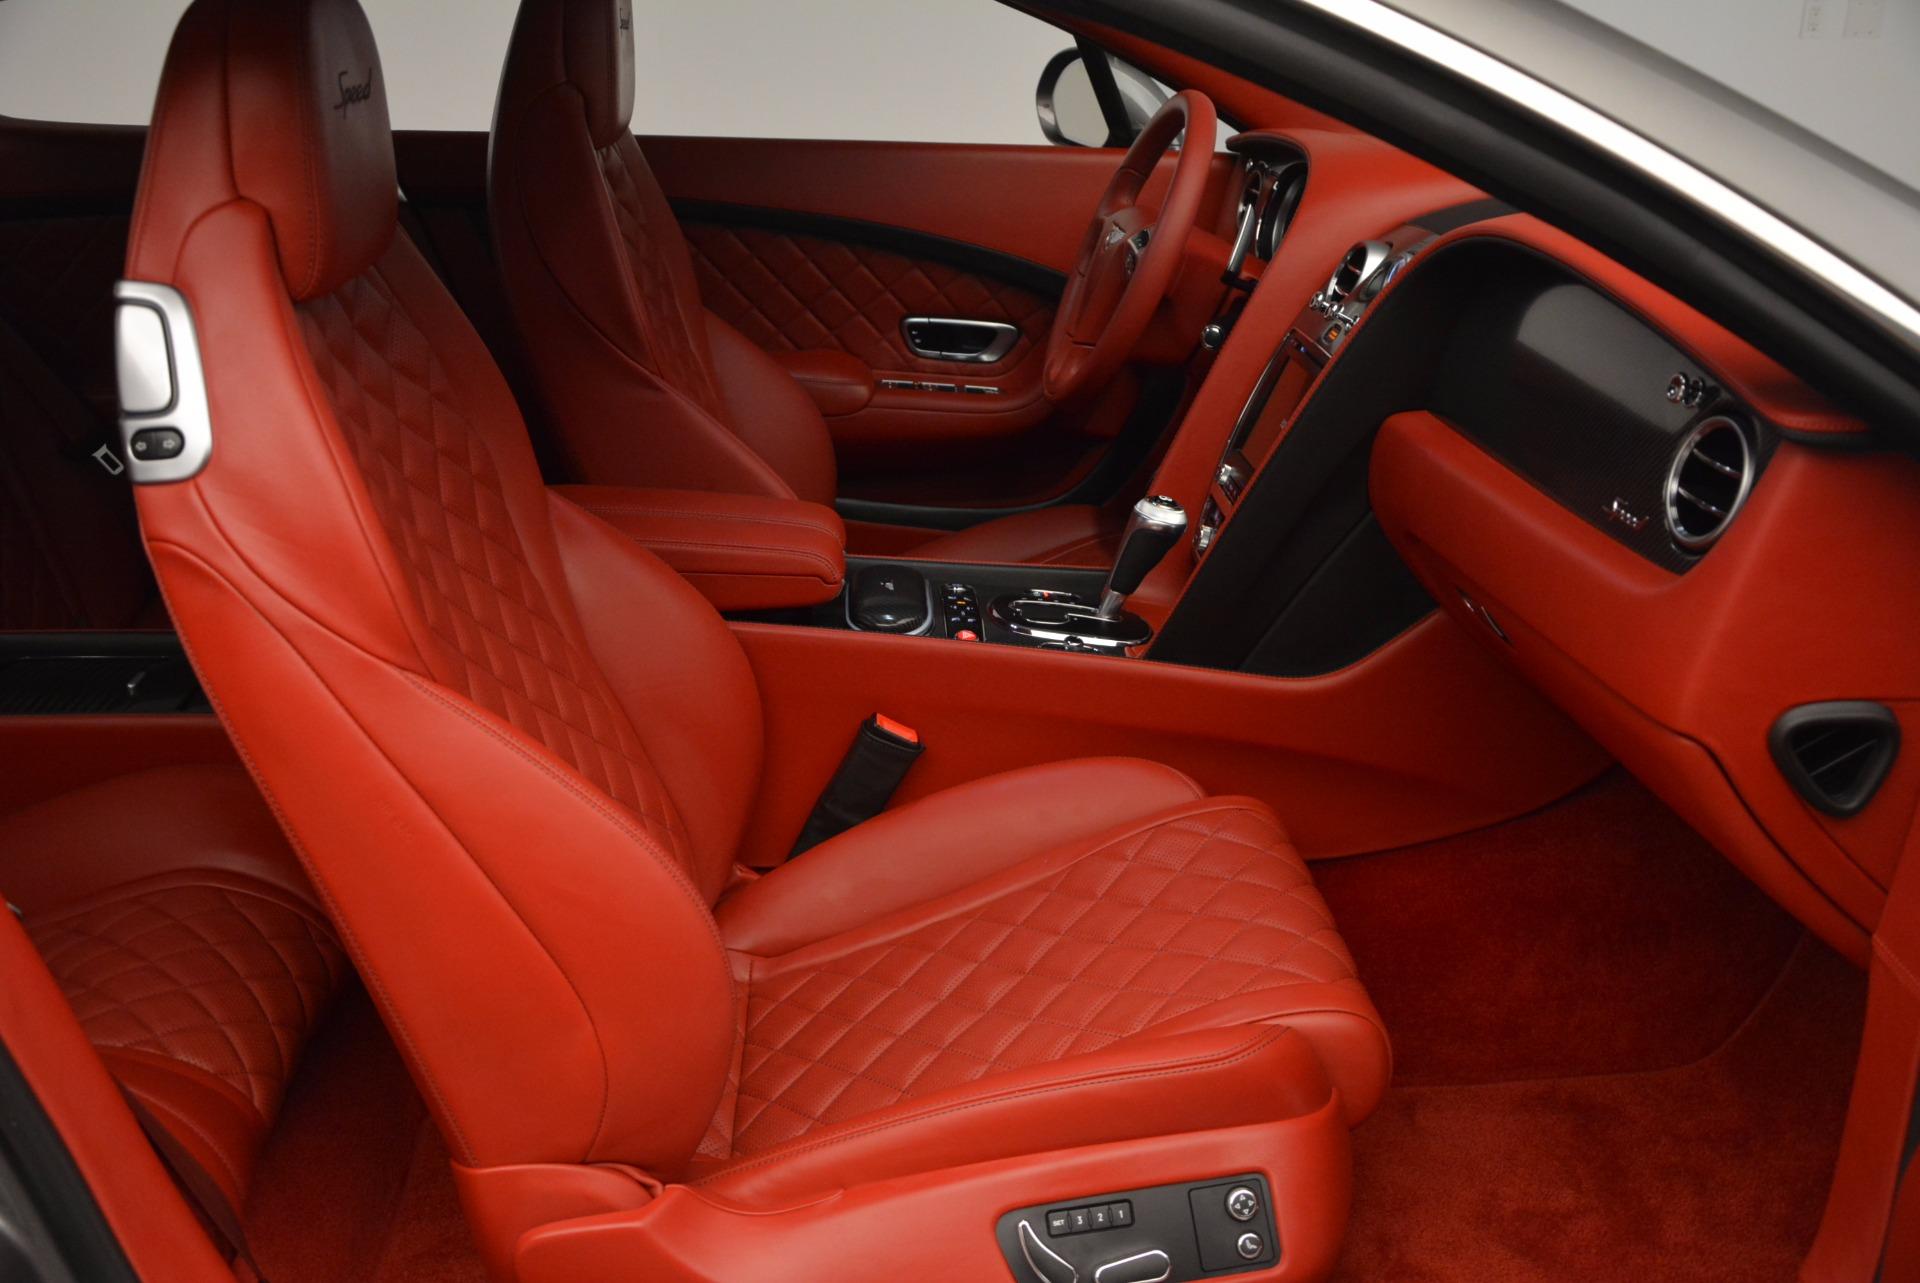 Used 2016 Bentley Continental GT Speed For Sale In Westport, CT 910_p38